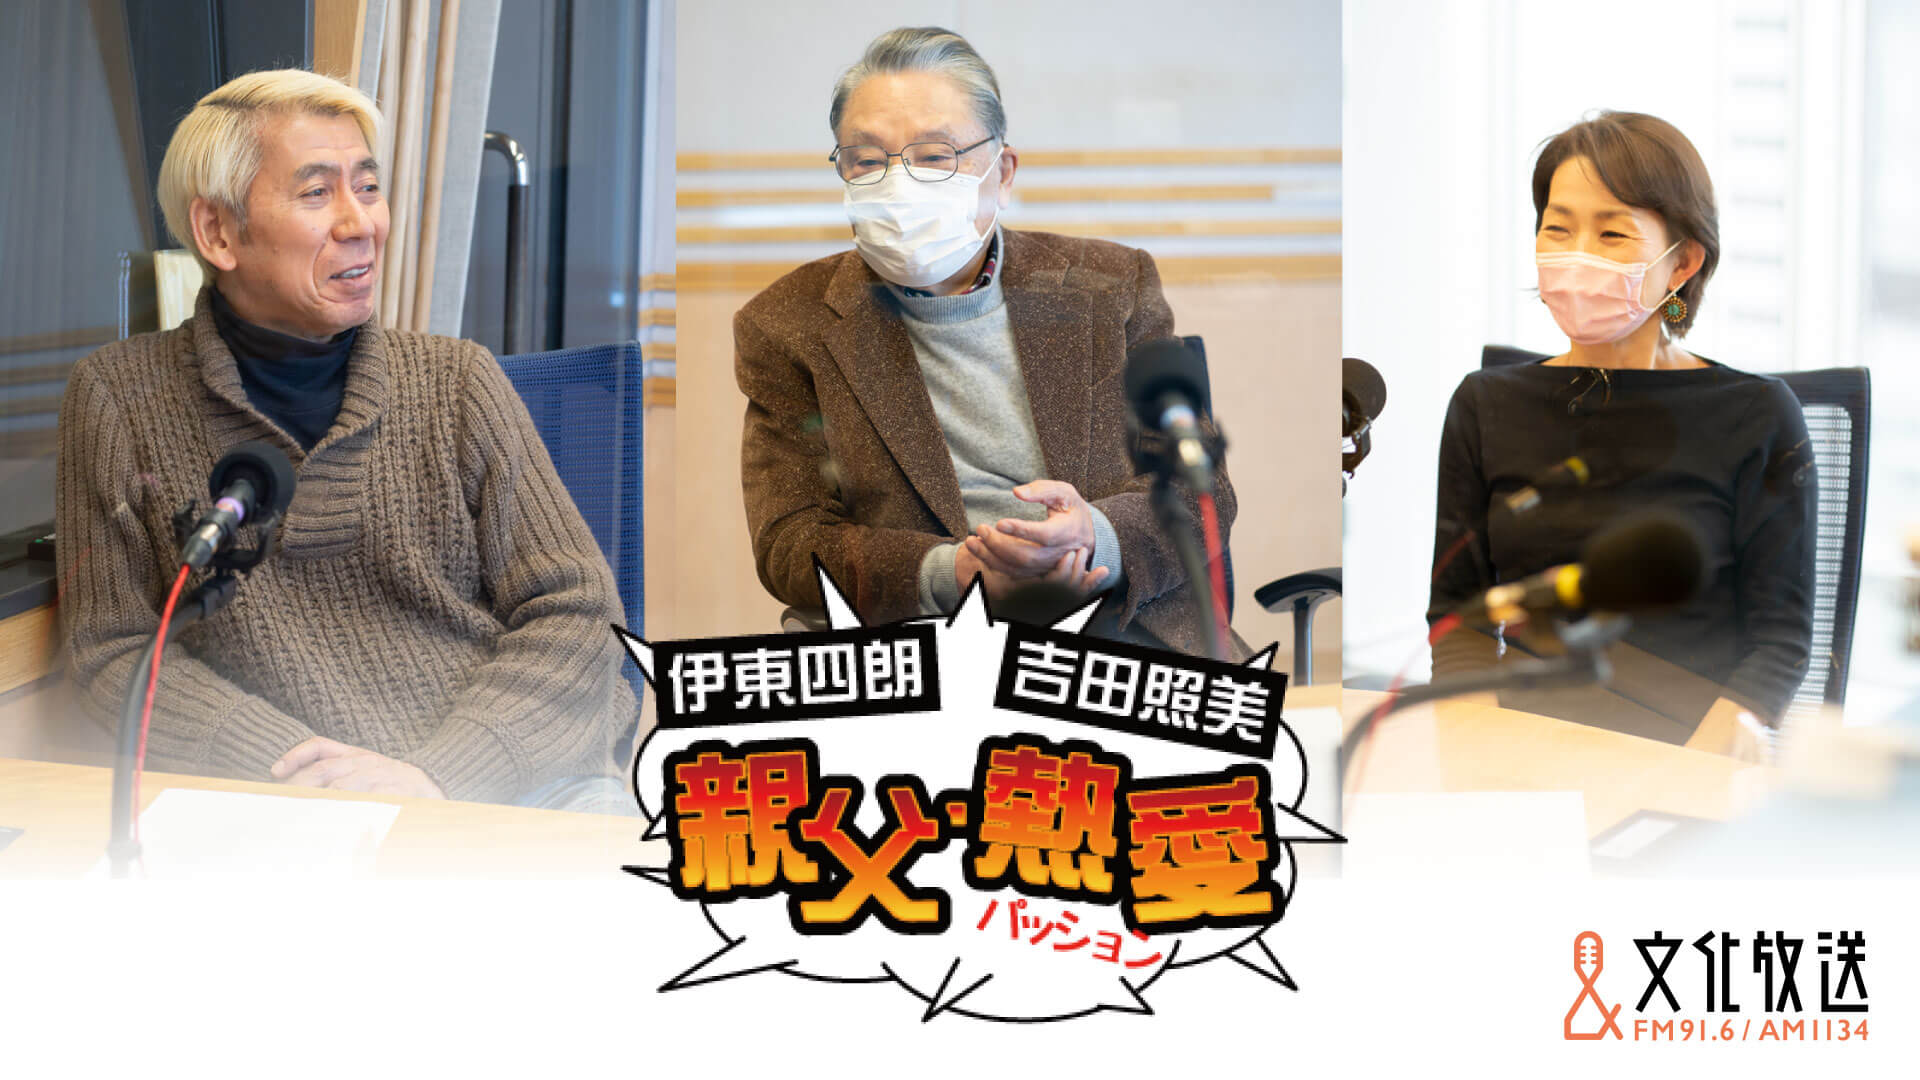 【文化放送 伊東四朗 吉田照美 親父・熱愛 パッション動画】#11